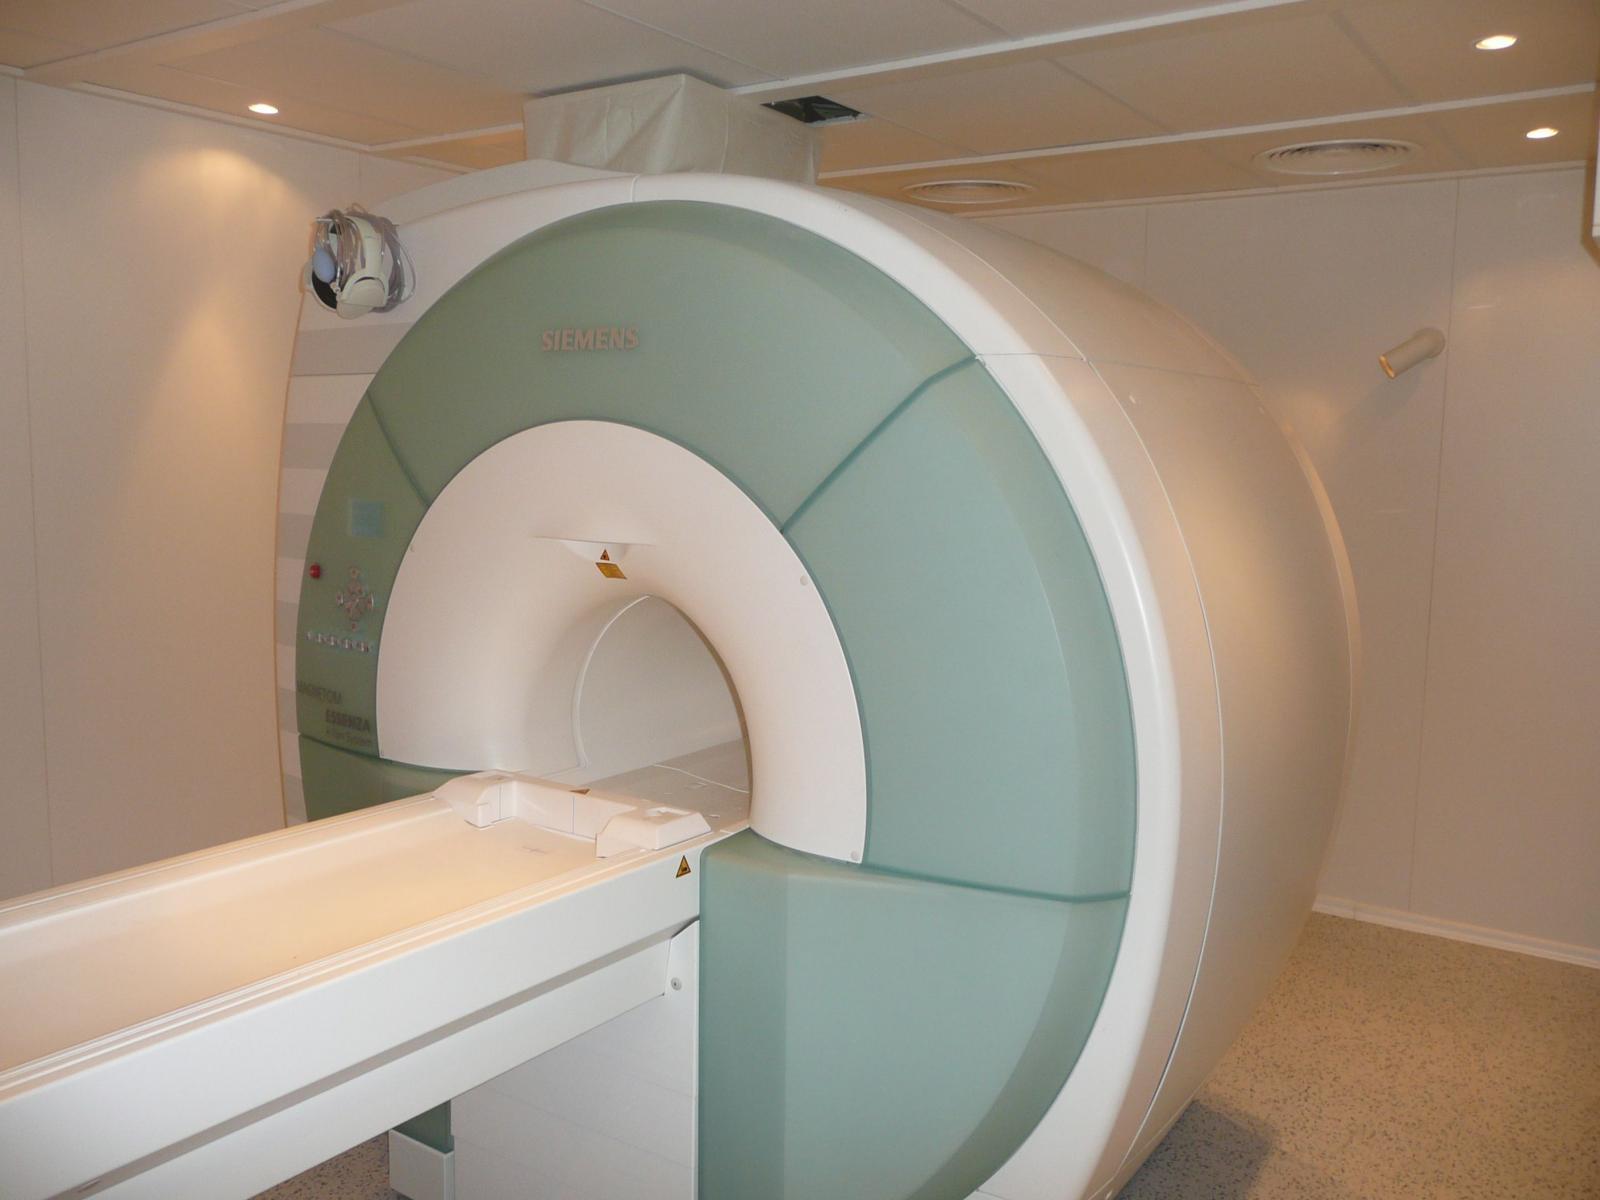 Hiperdia - Centre de diagnostic imagistic si laborator - RMN_siemens_1,5.JPG